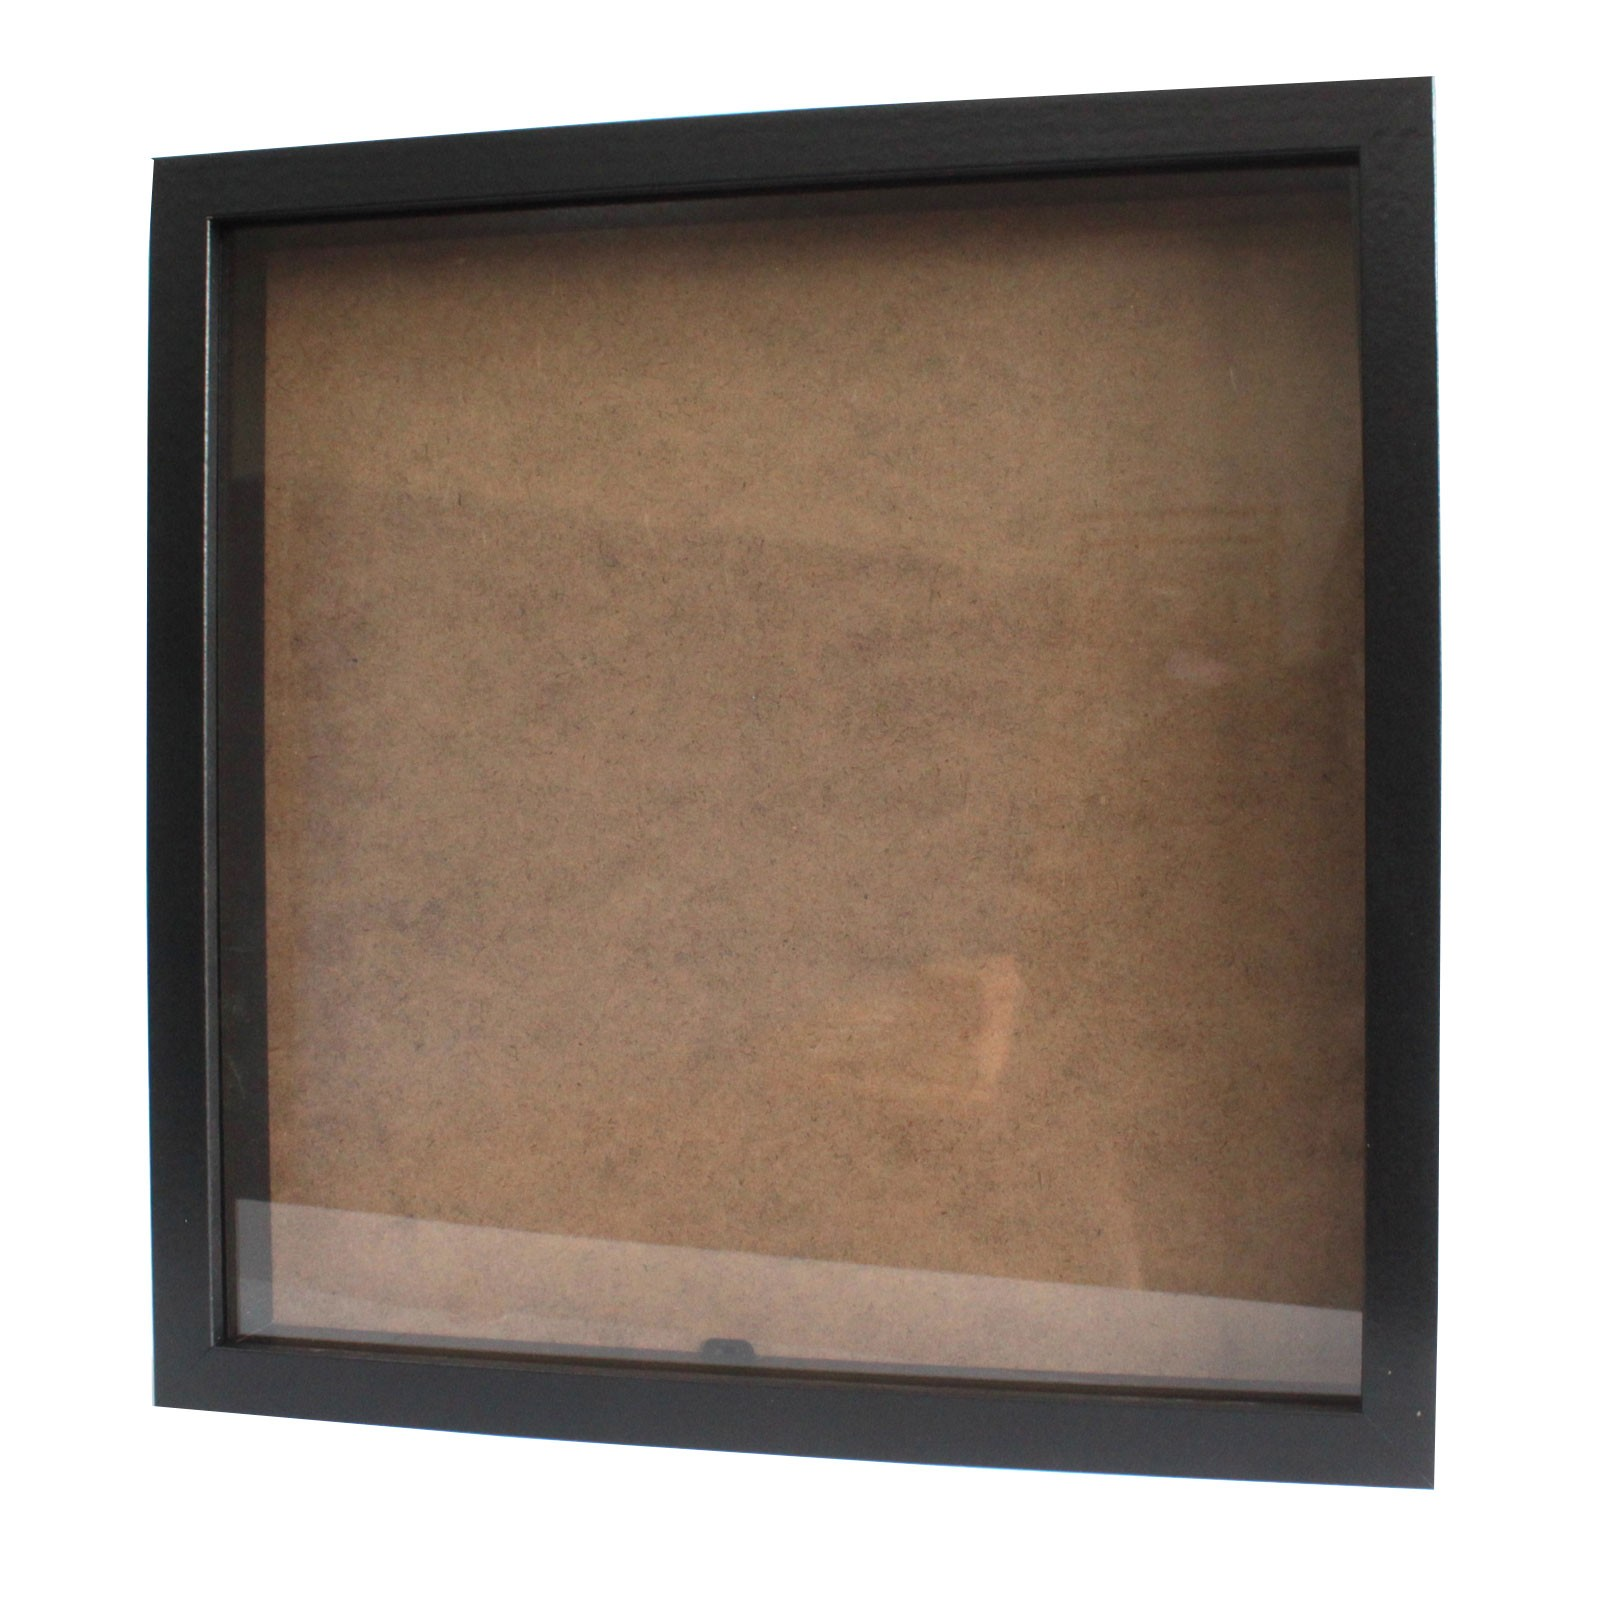 Deep Box Frame Large Square 34x34cm Black